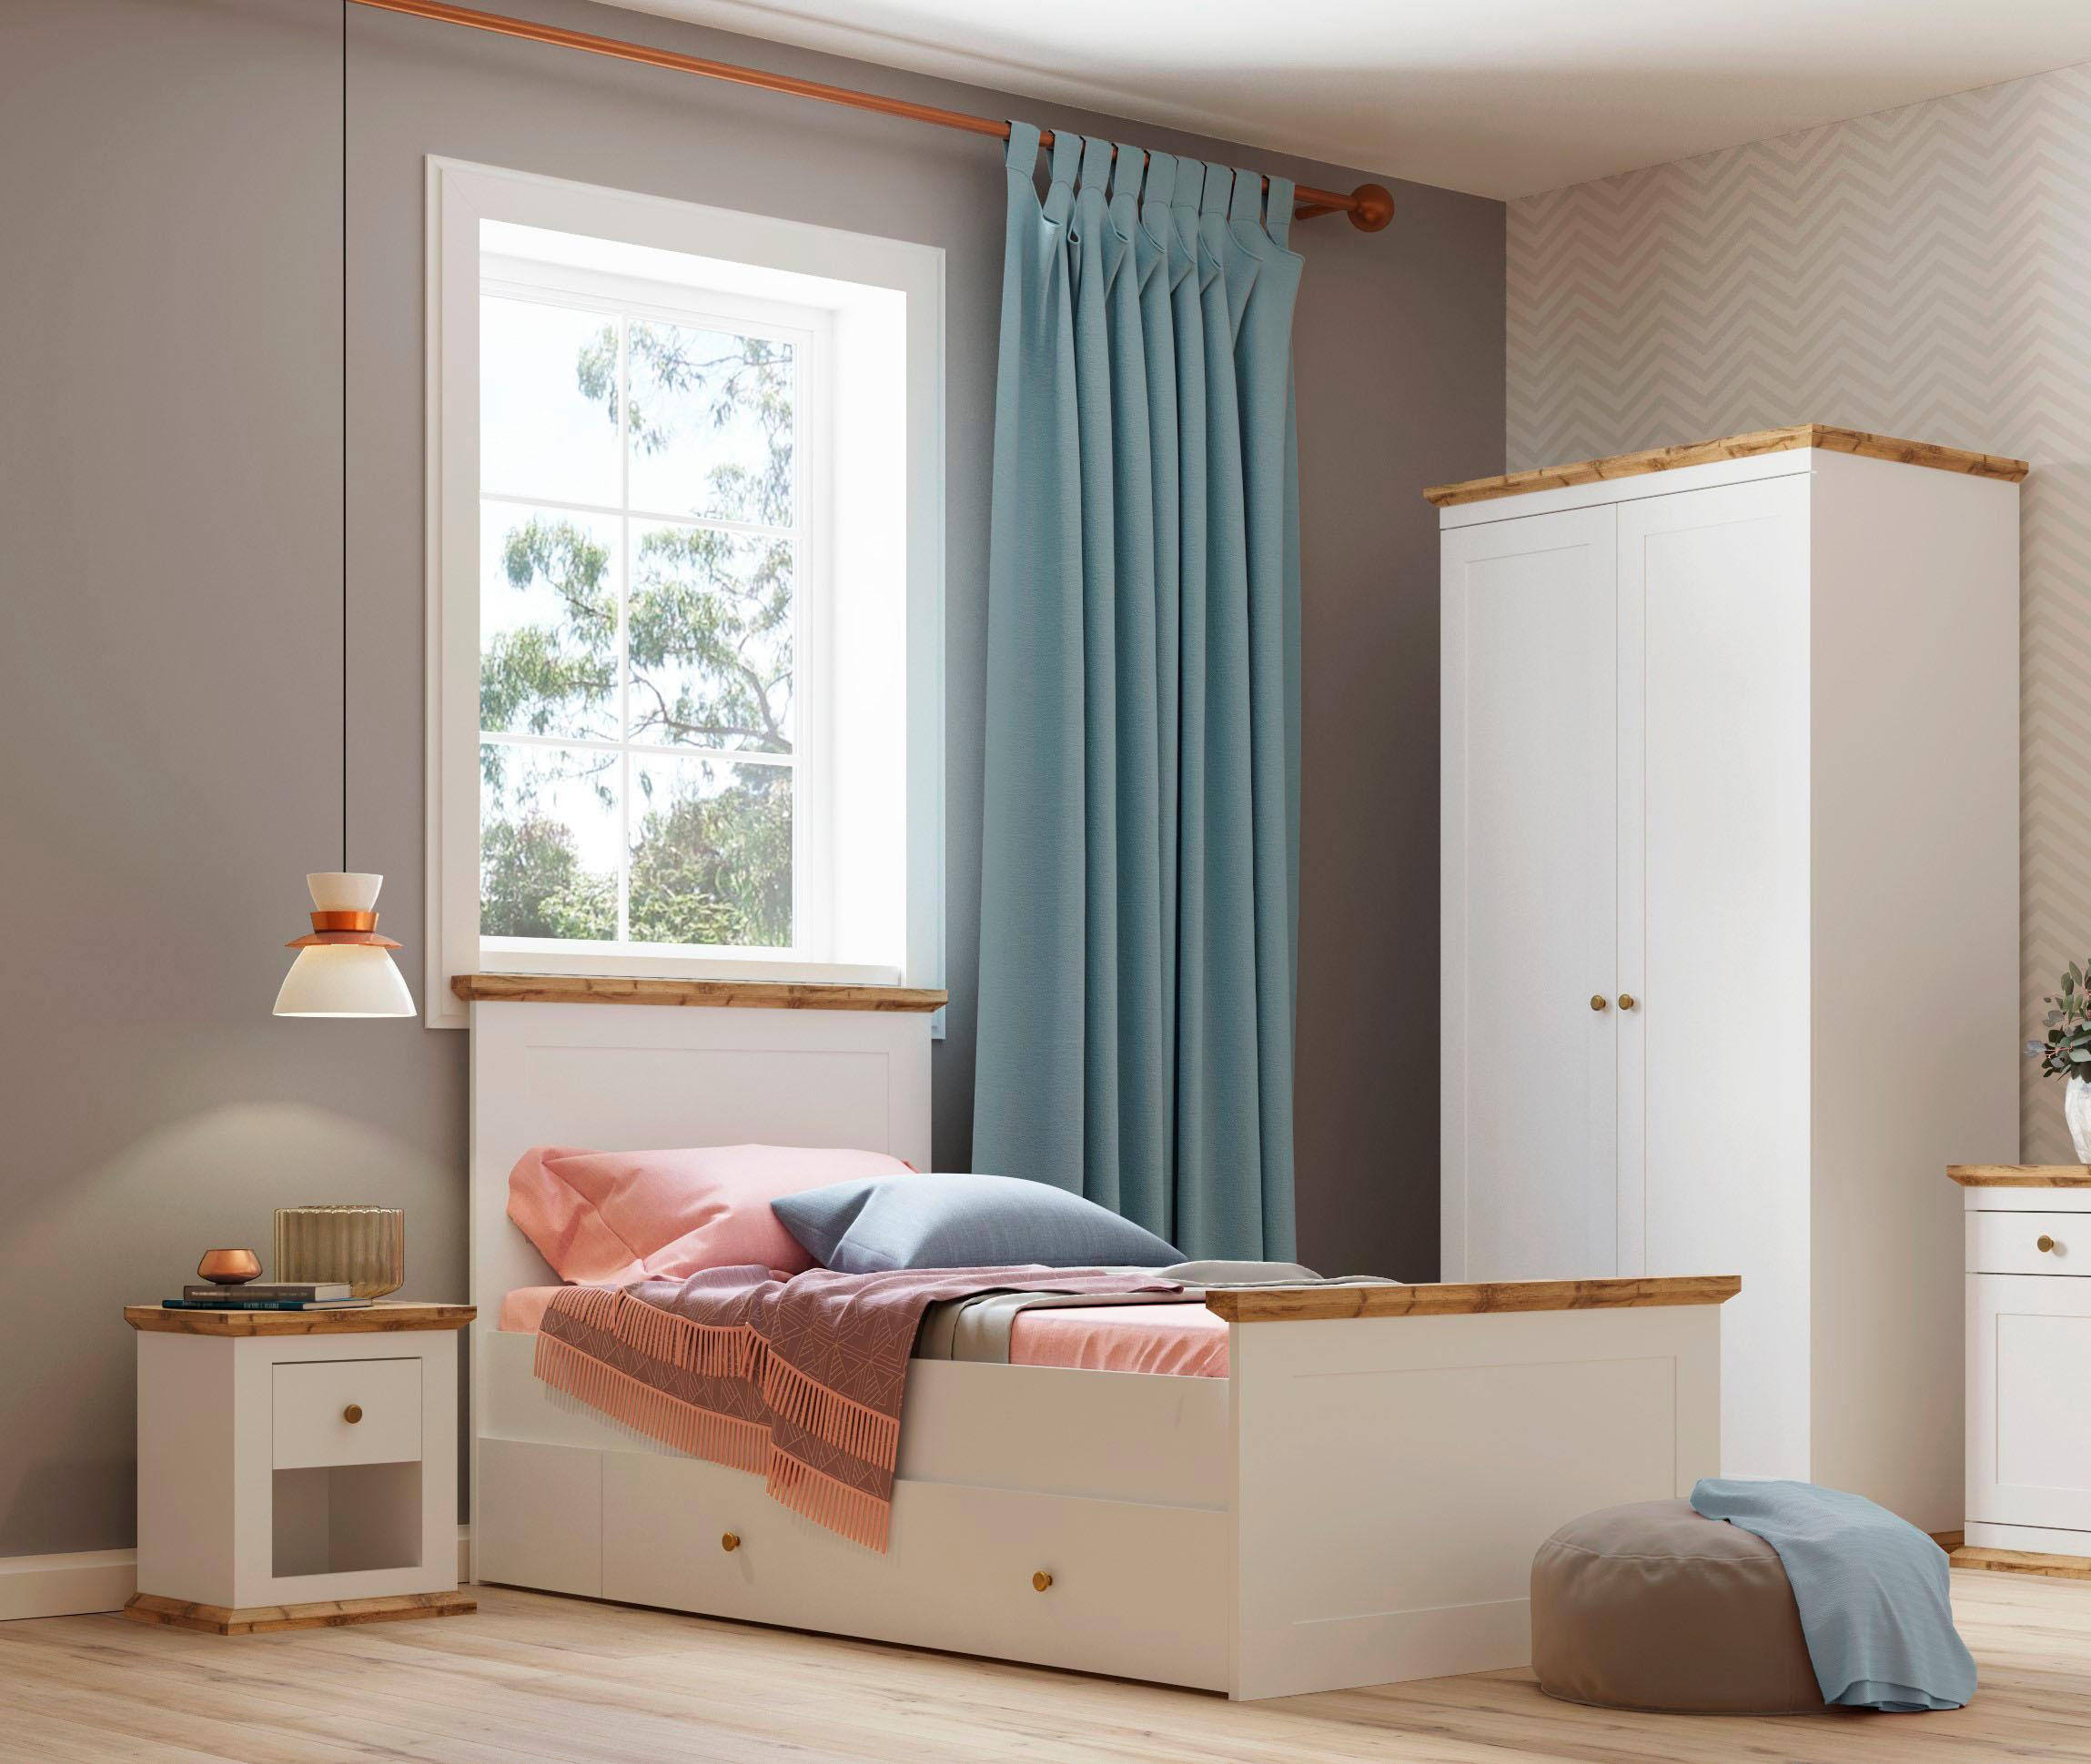 Home affaire Schlafzimmer-Set Banburry (Set 3-tlg)